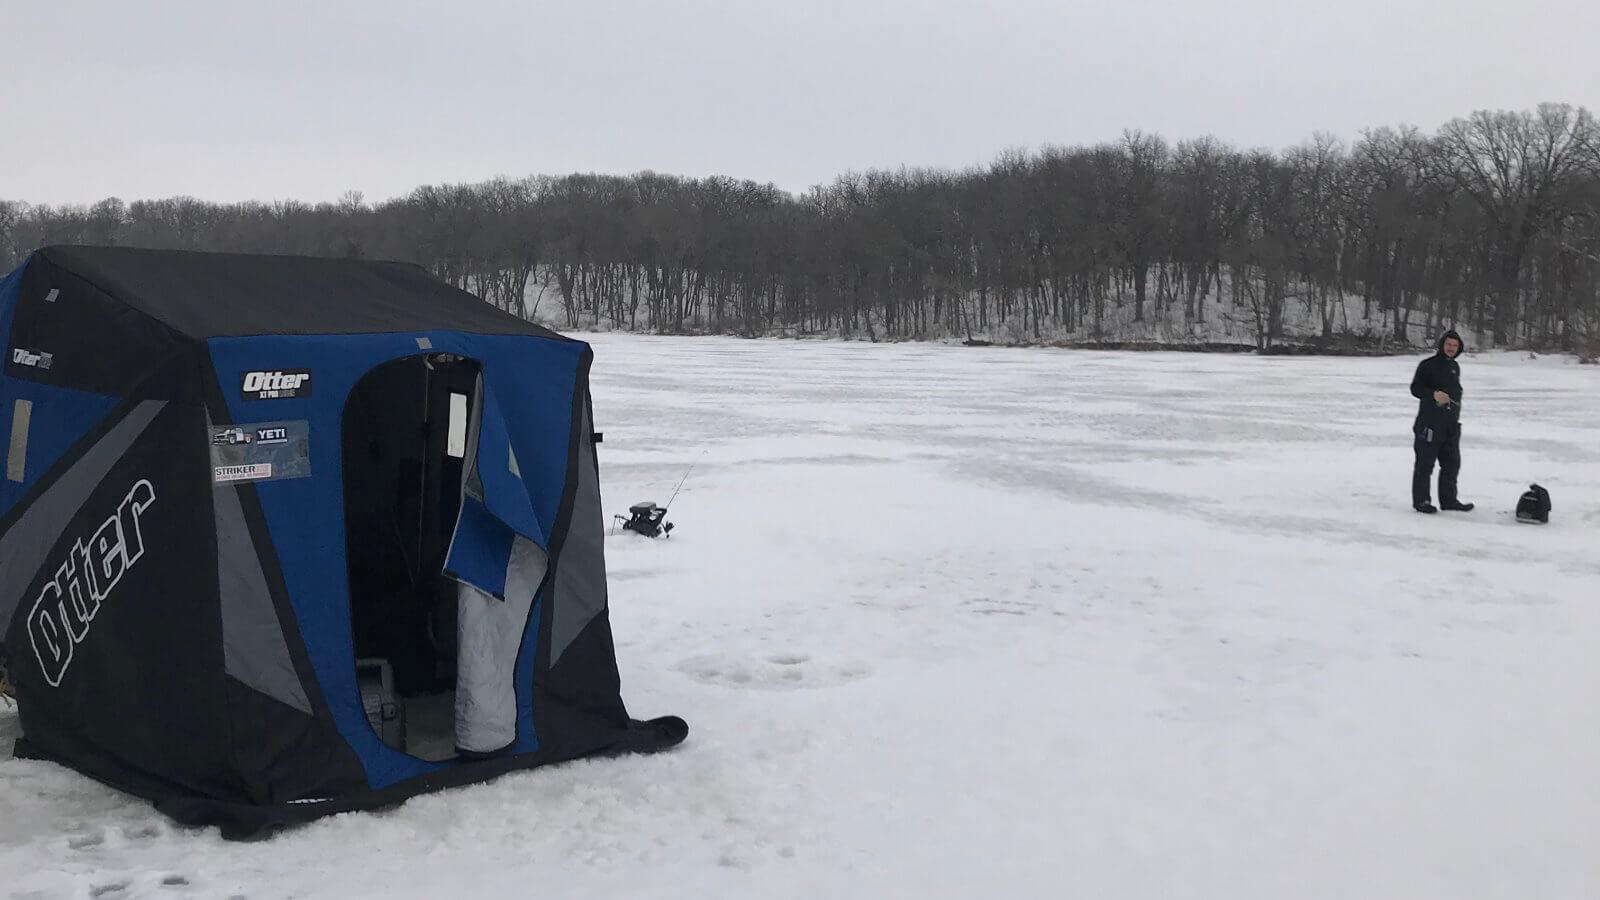 The Short Rod Show Ice Fishing